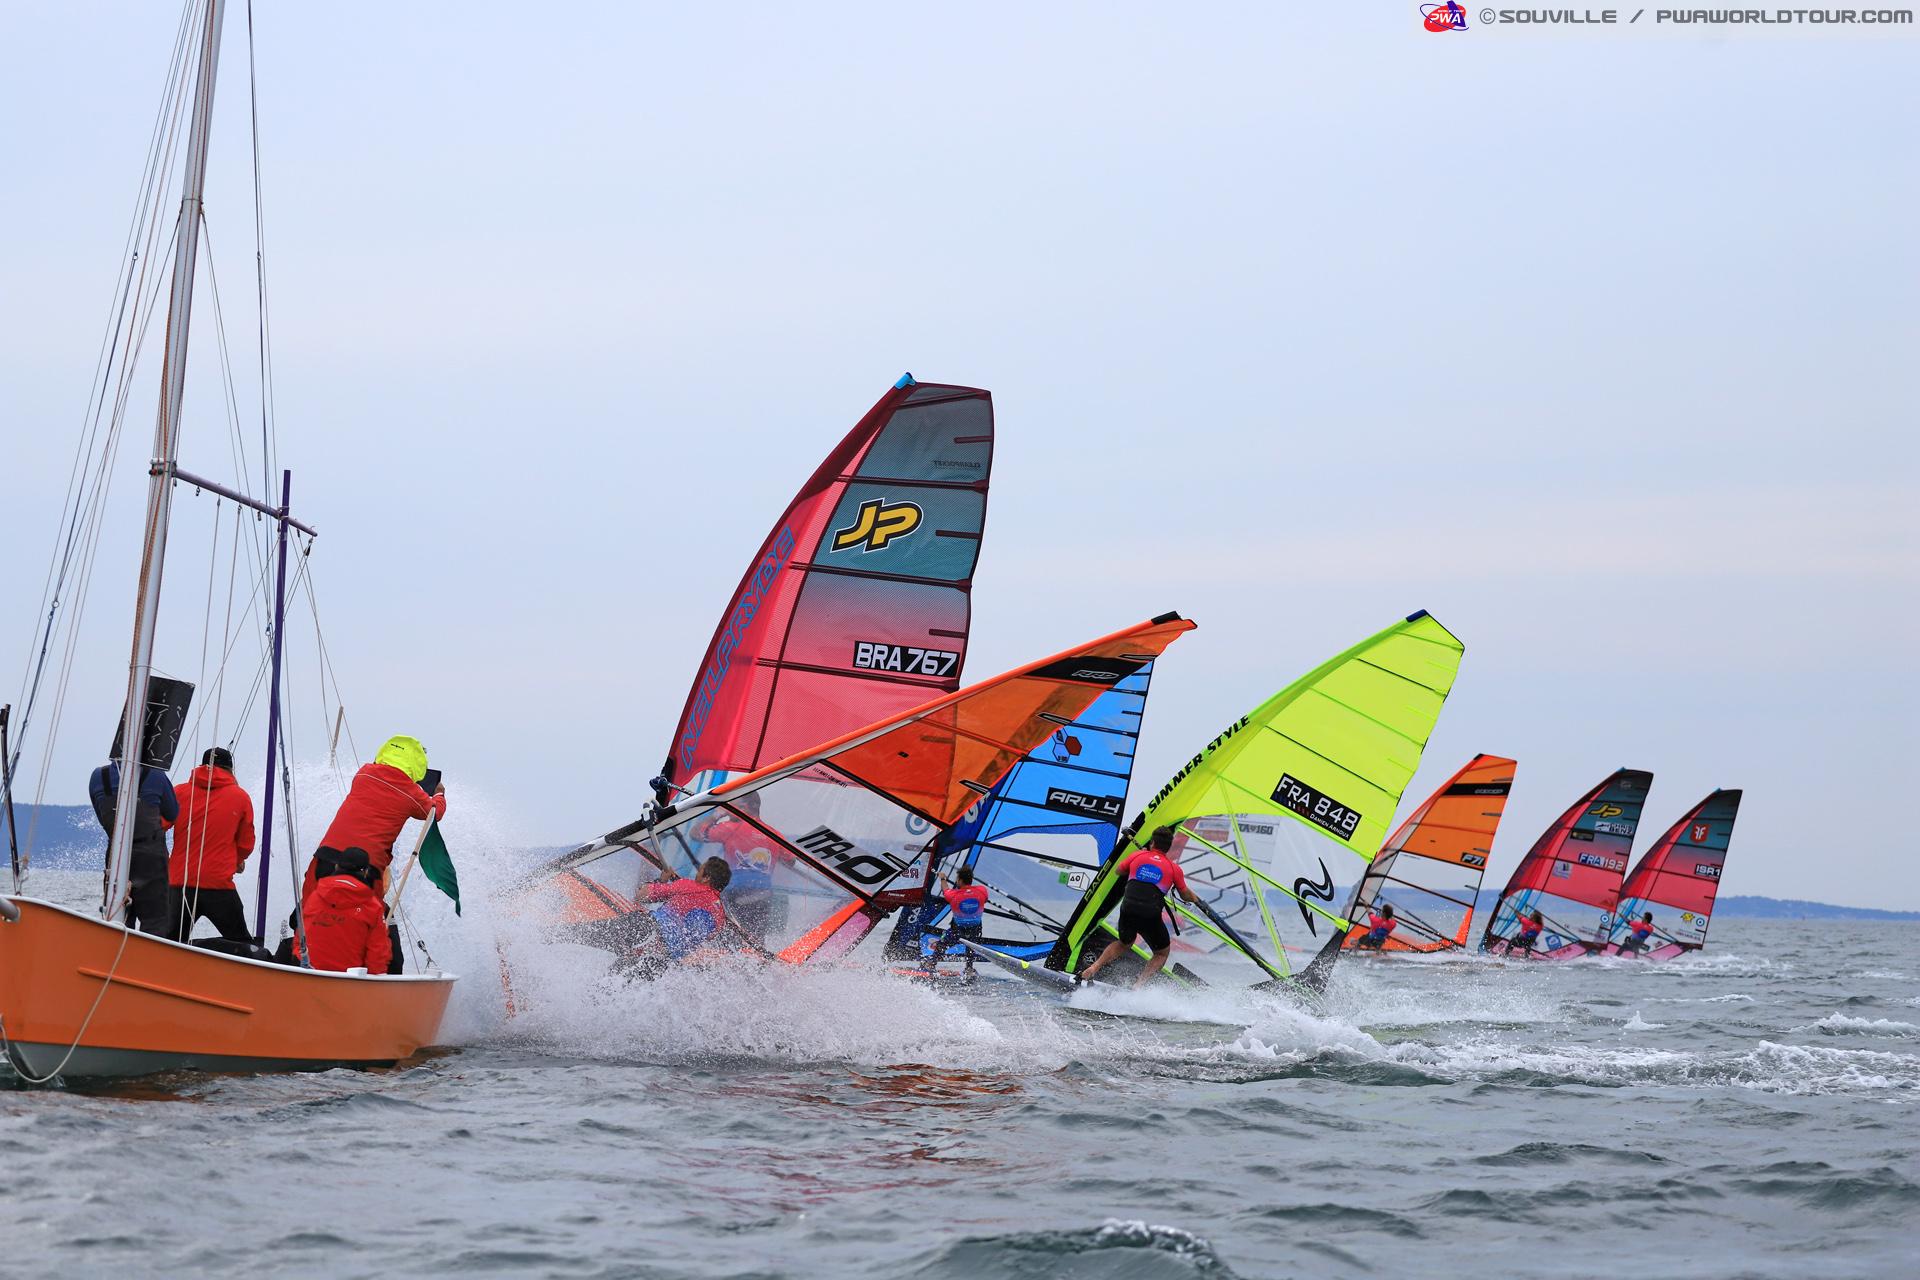 Andrea Rosati slams on the breaks